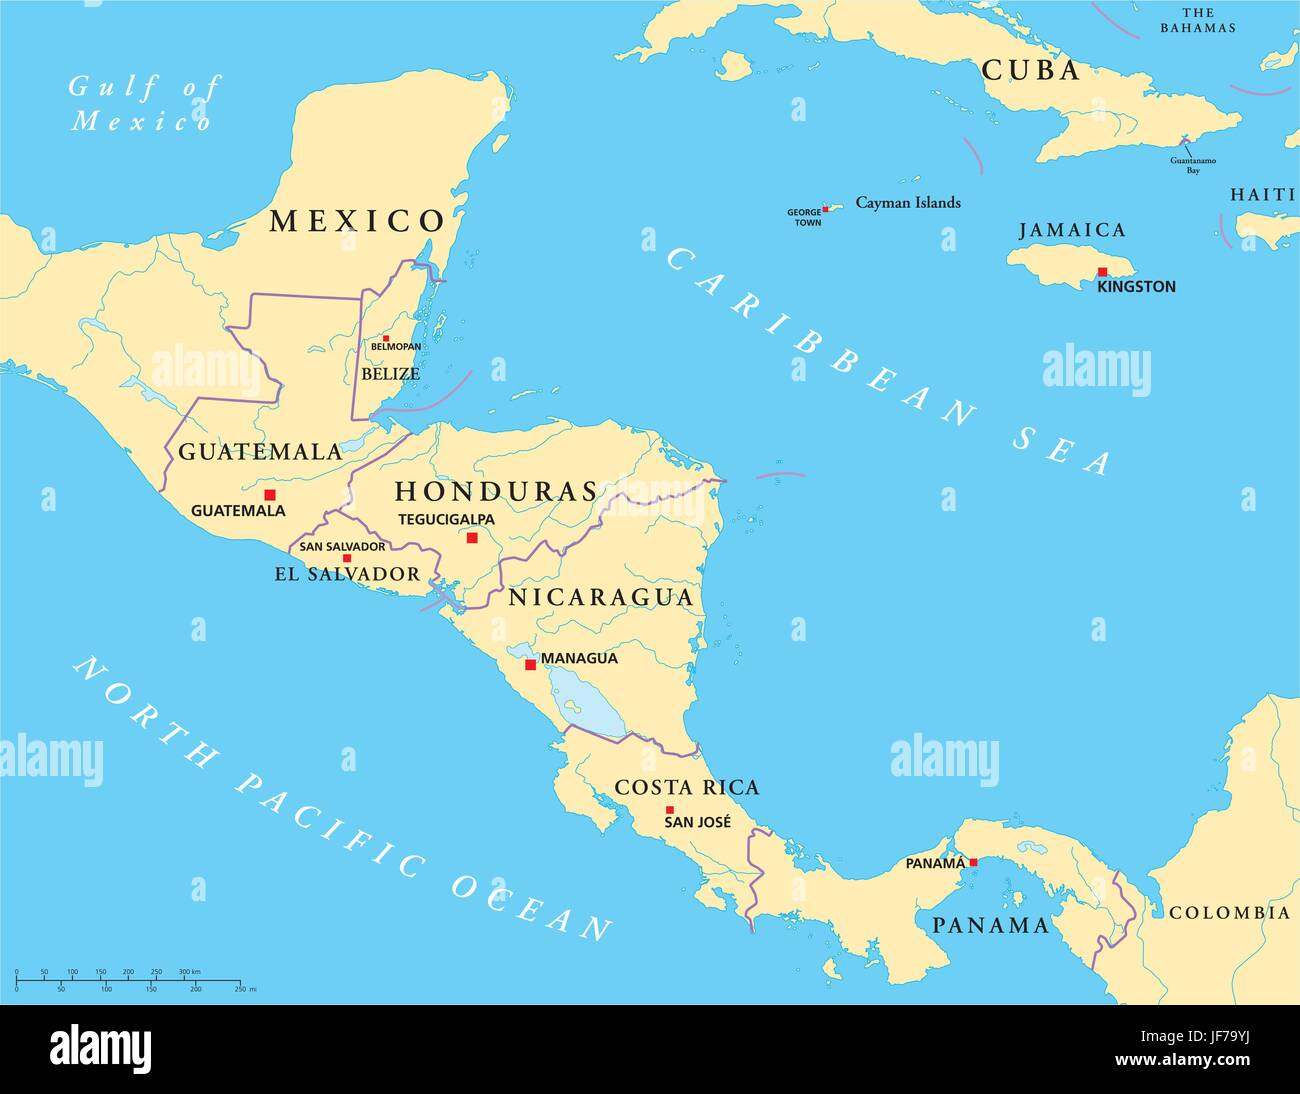 America Central America Guatemala Central Honduras Map Stock - Hondurus map